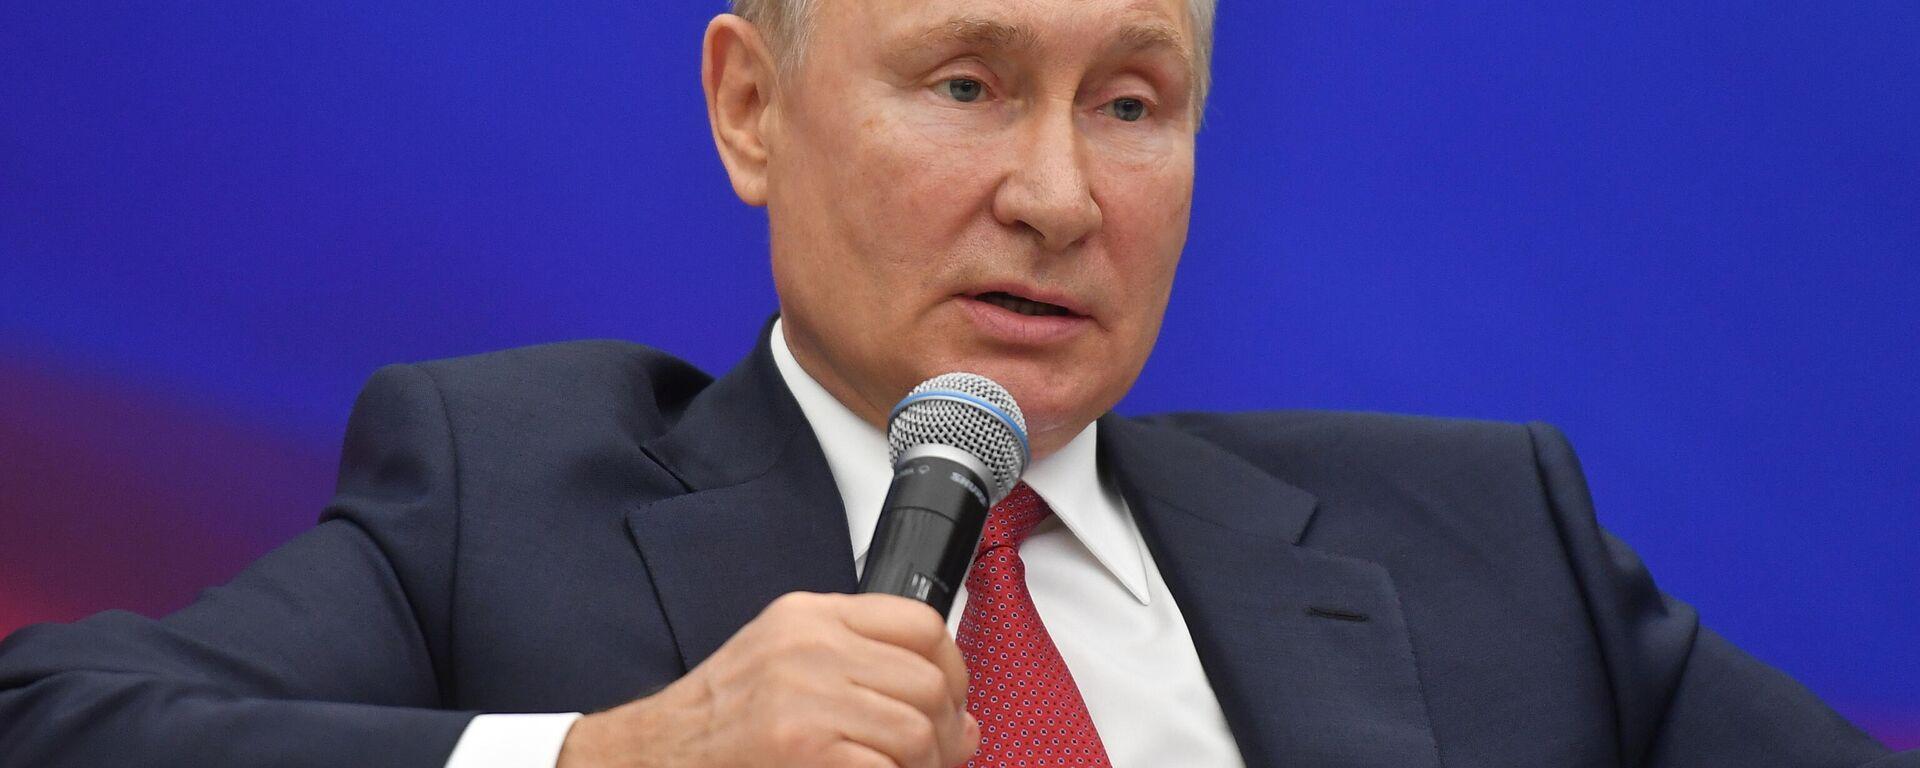 Predsednik Rusije Vladimir Putin - Sputnik Srbija, 1920, 03.09.2021